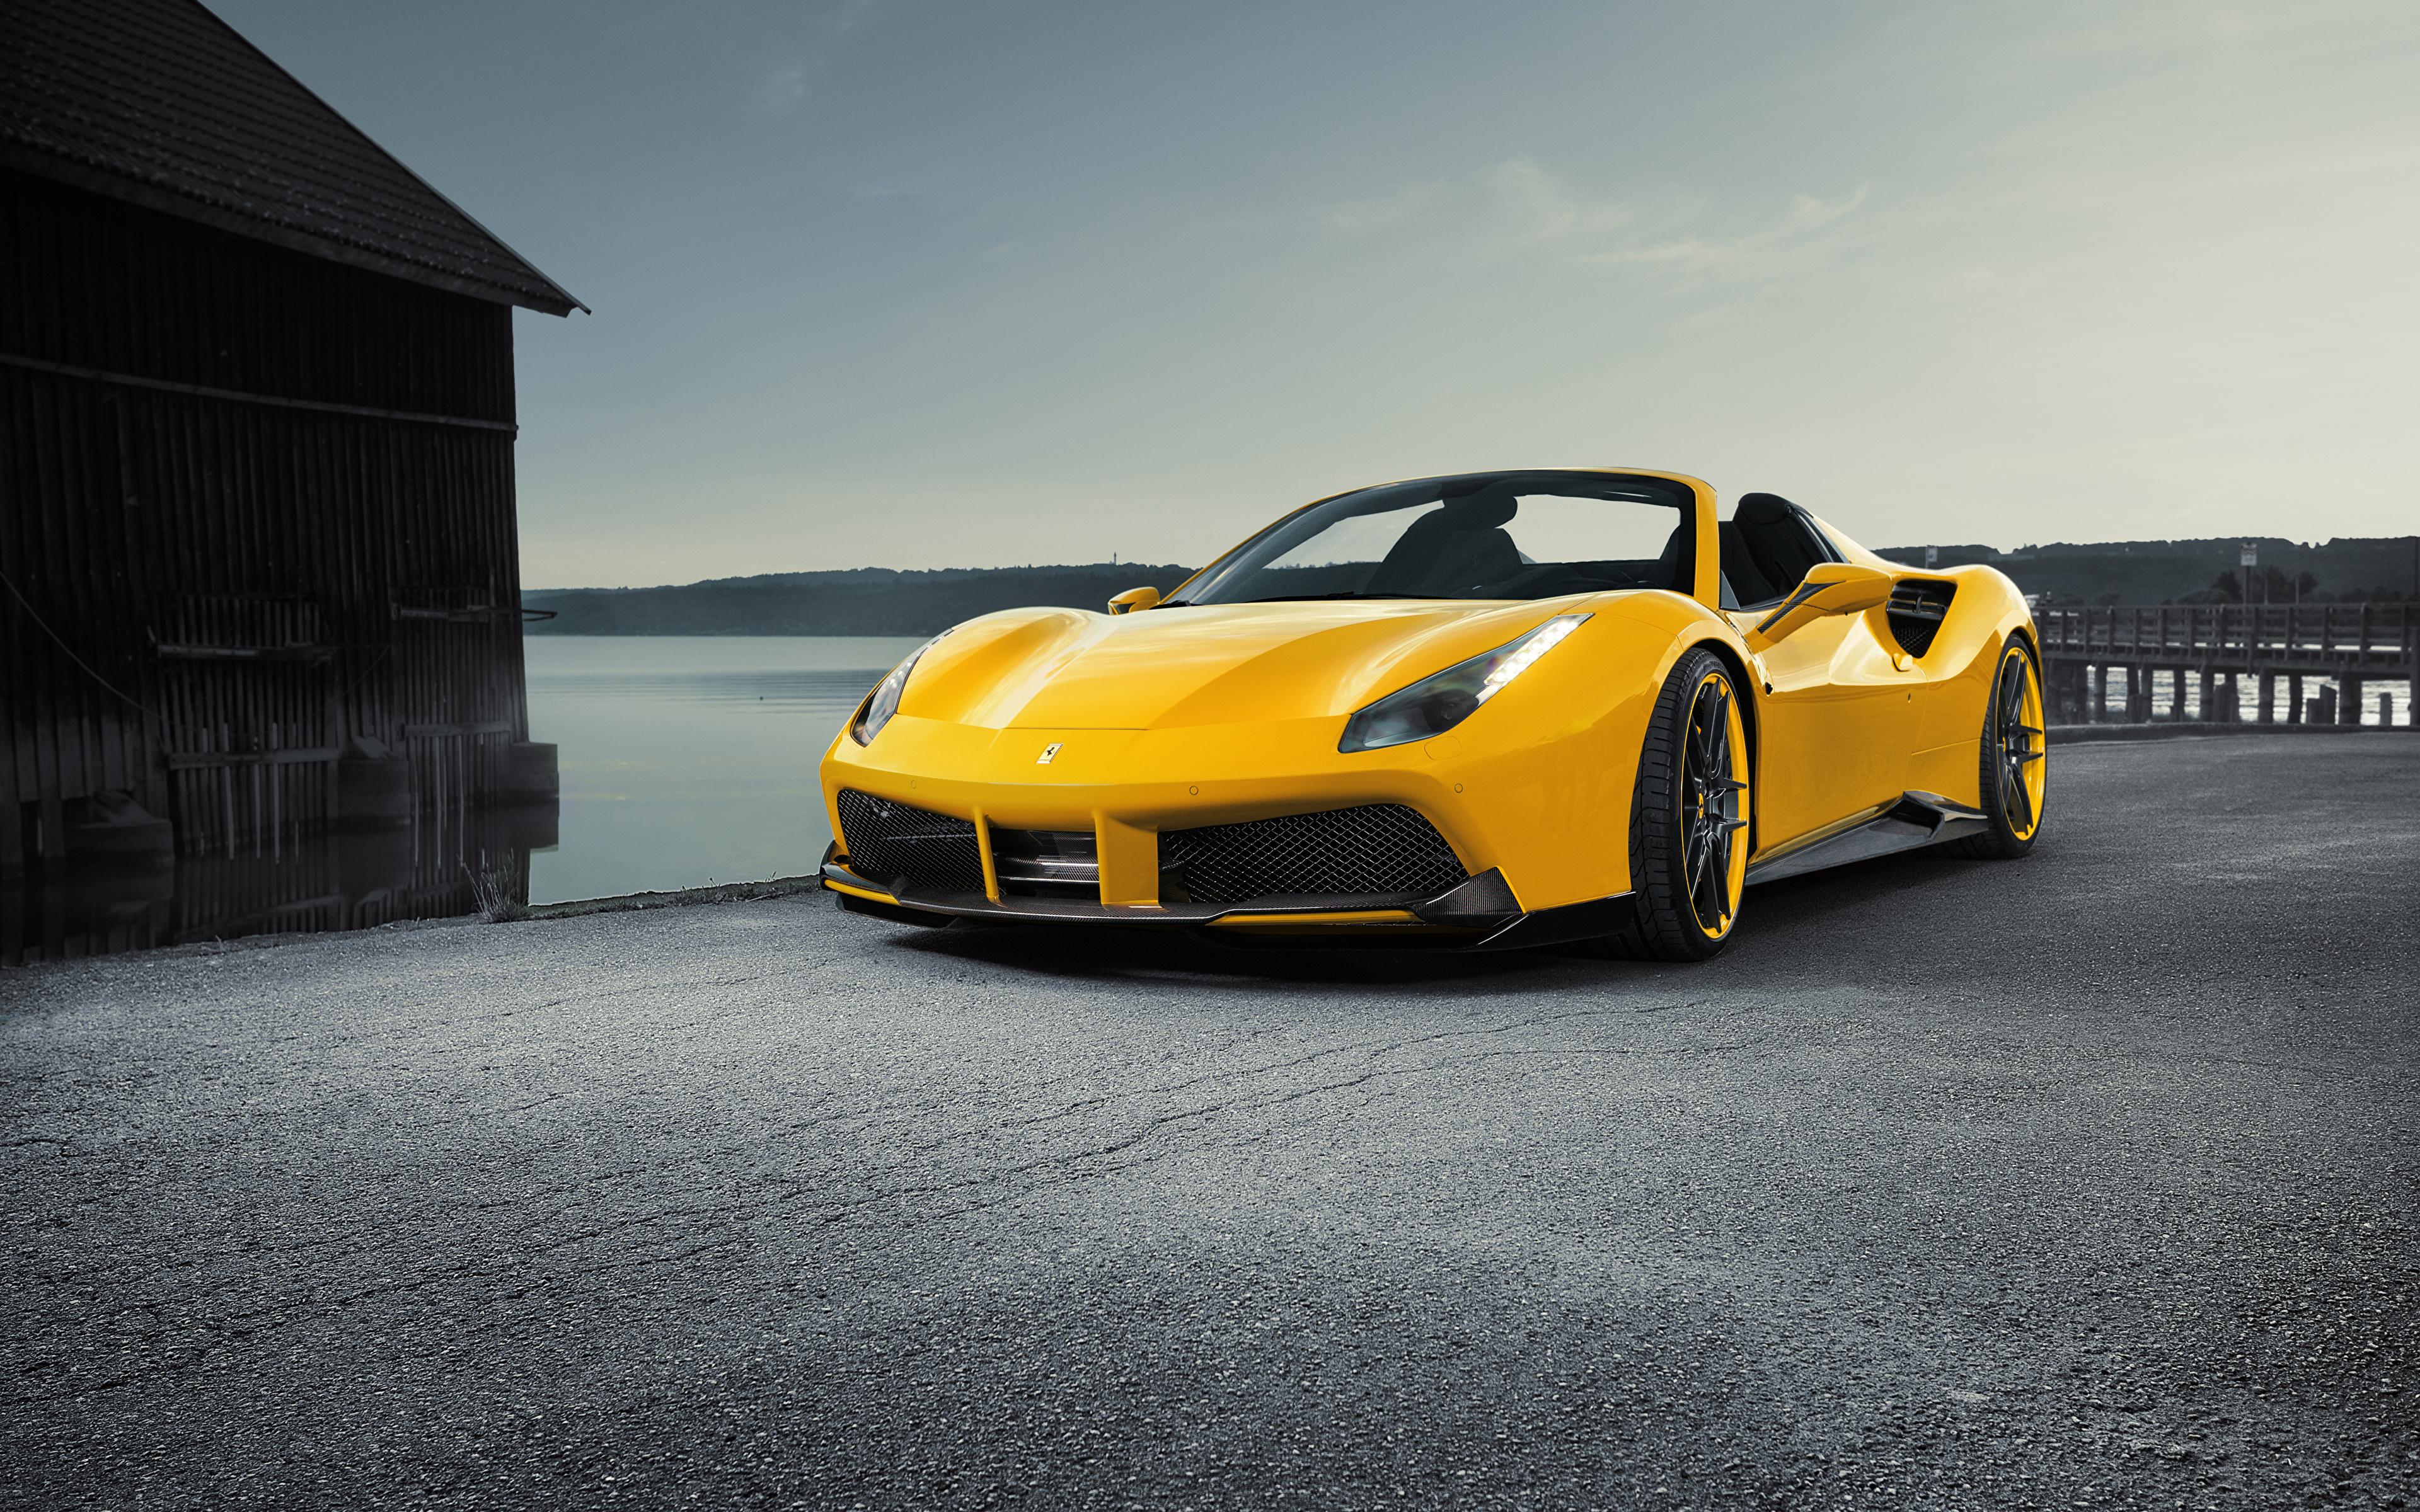 Фотография Ferrari Spider Rosso Novitec 488 Родстер желтая Машины 3840x2400 Феррари желтых желтые Желтый Авто Автомобили